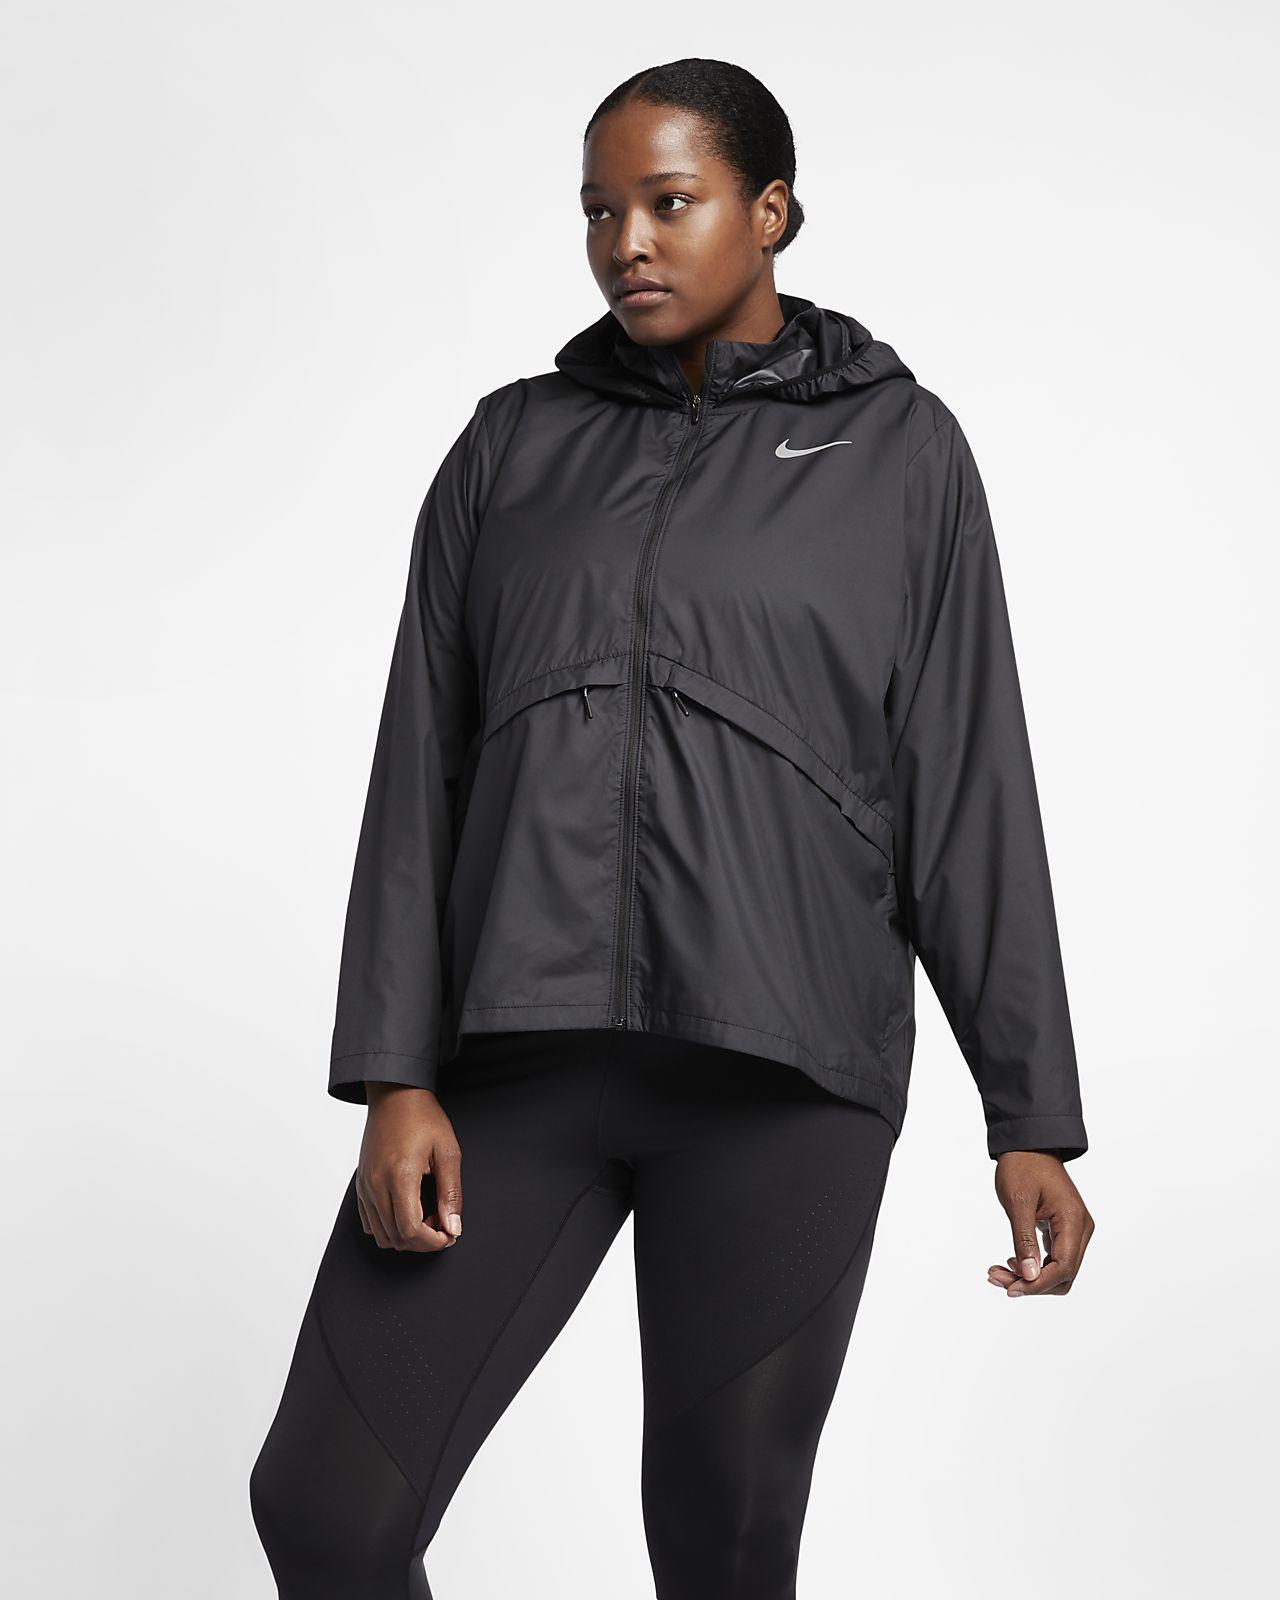 482484be Женская беговая куртка Nike Essential (большие размеры). Nike.com RU